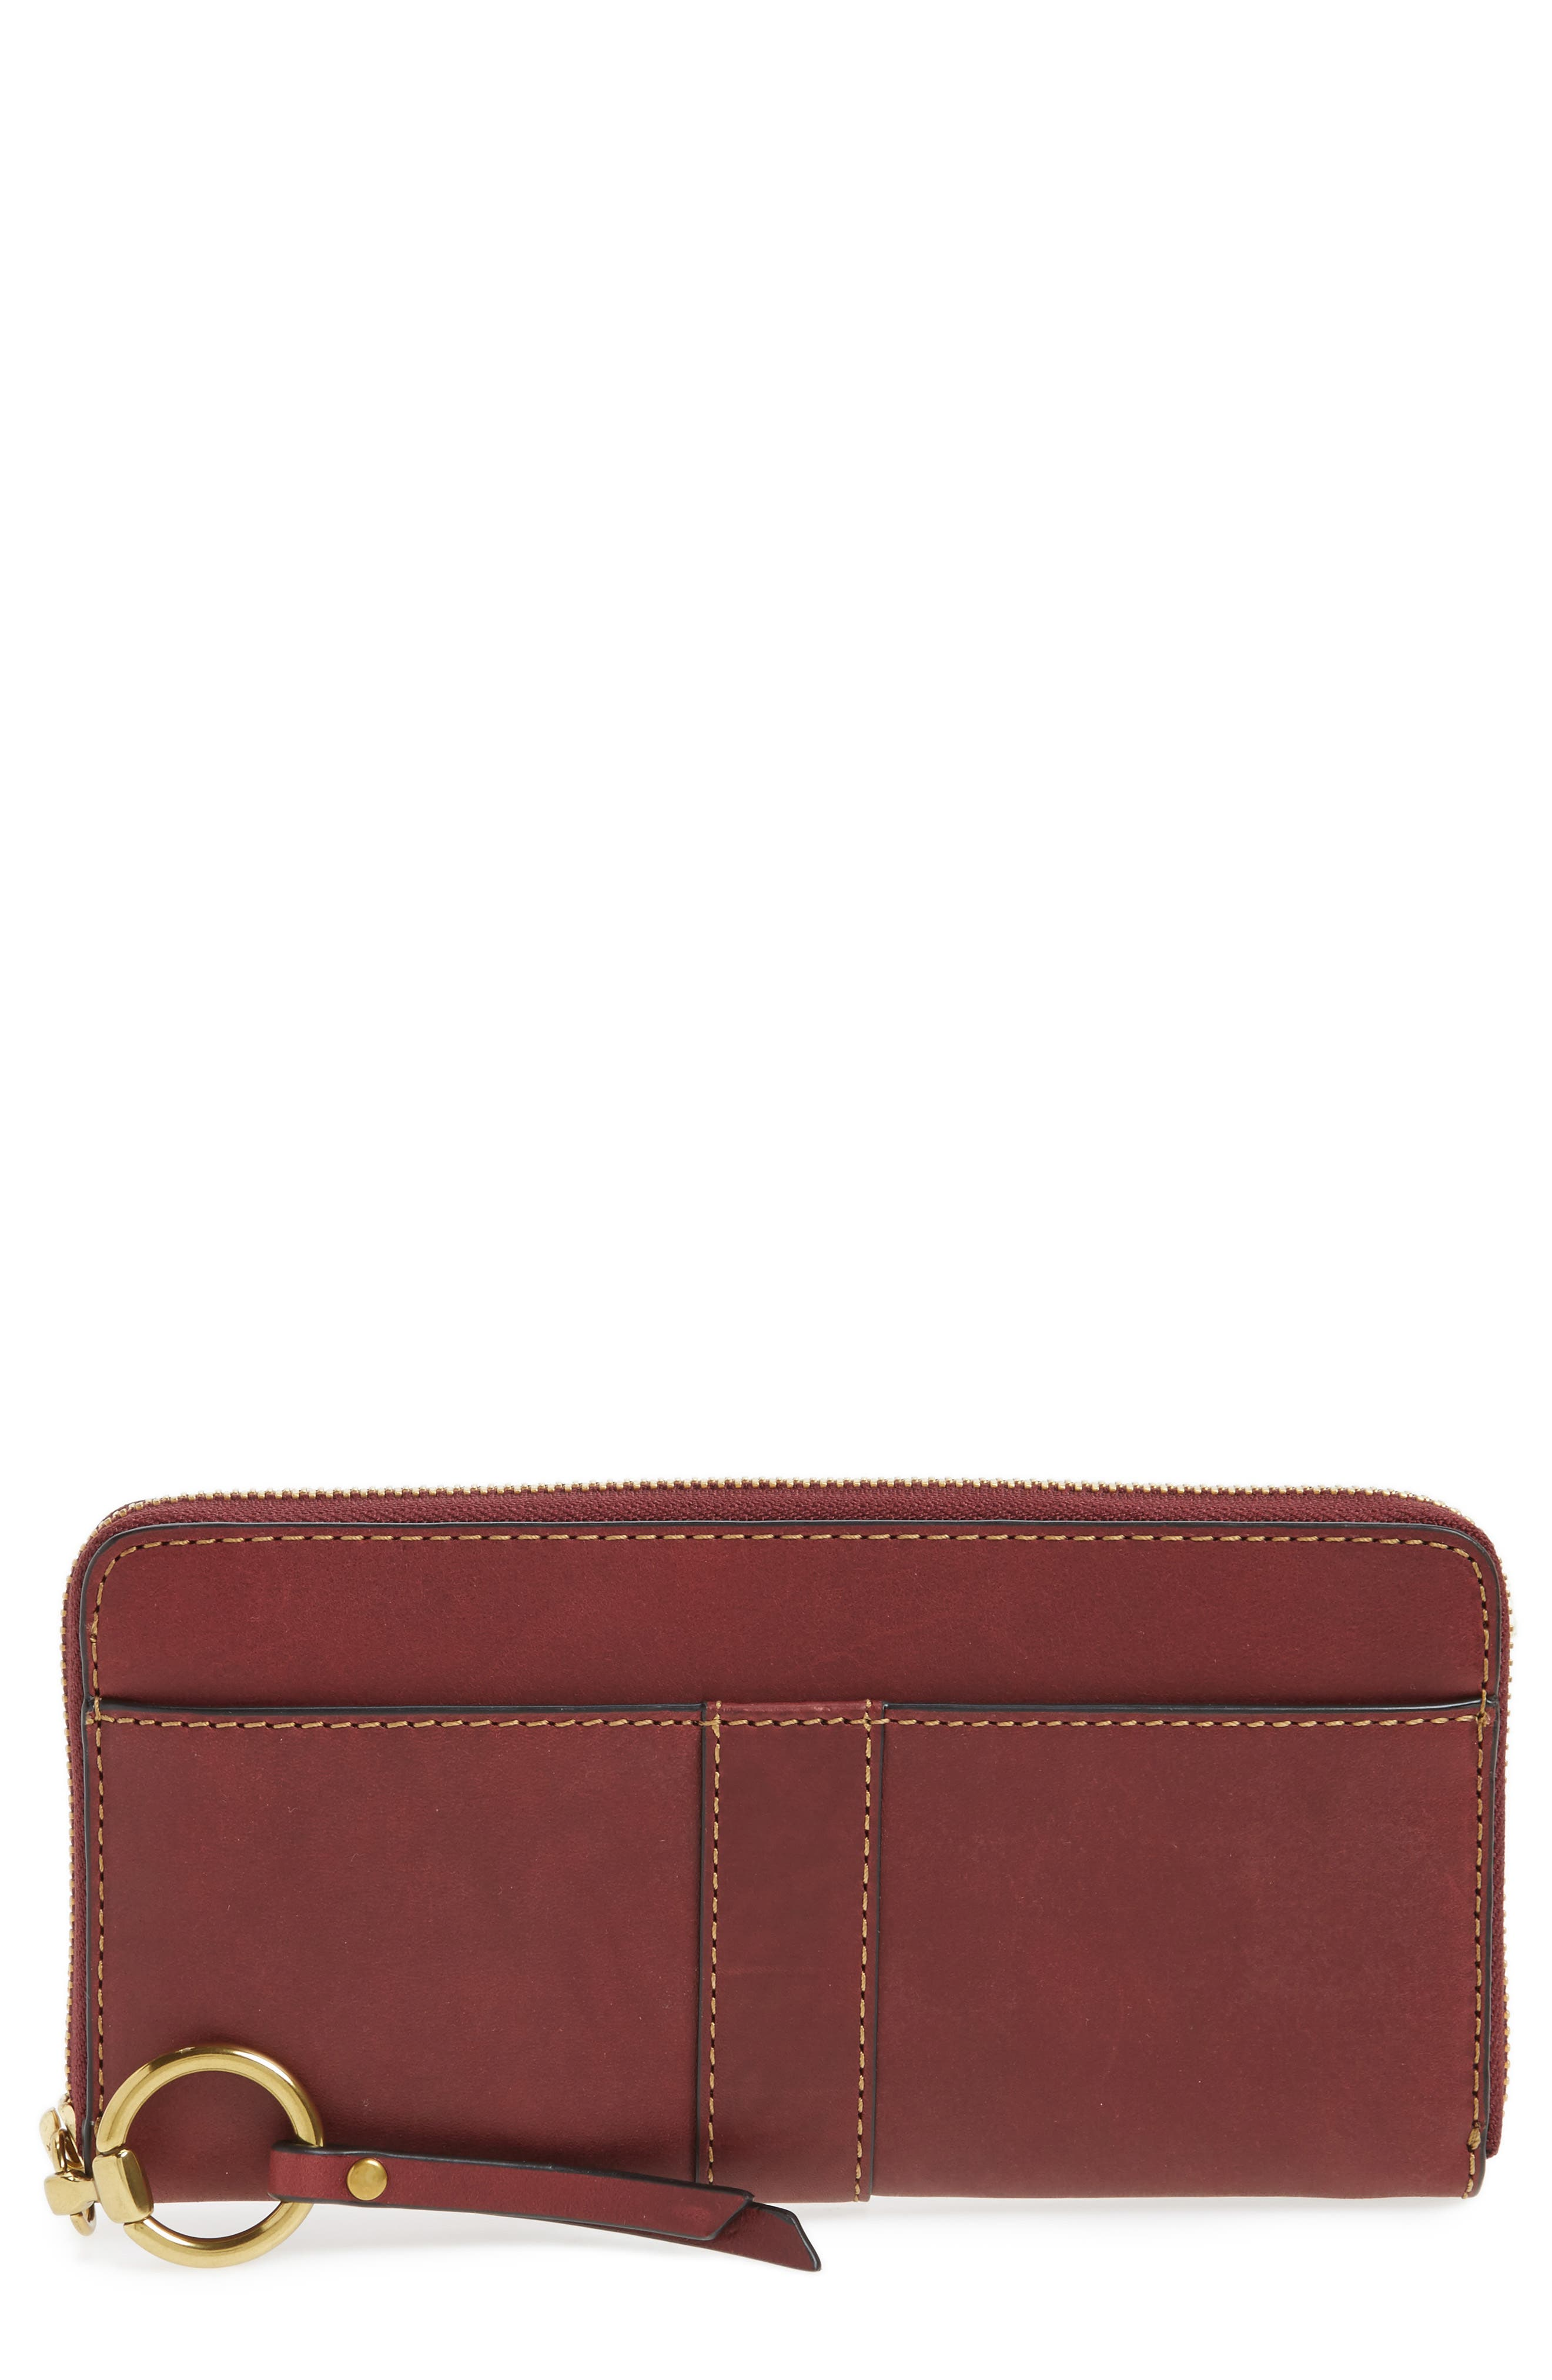 Main Image - Frye Ilana Harness Leather Zip Wallet